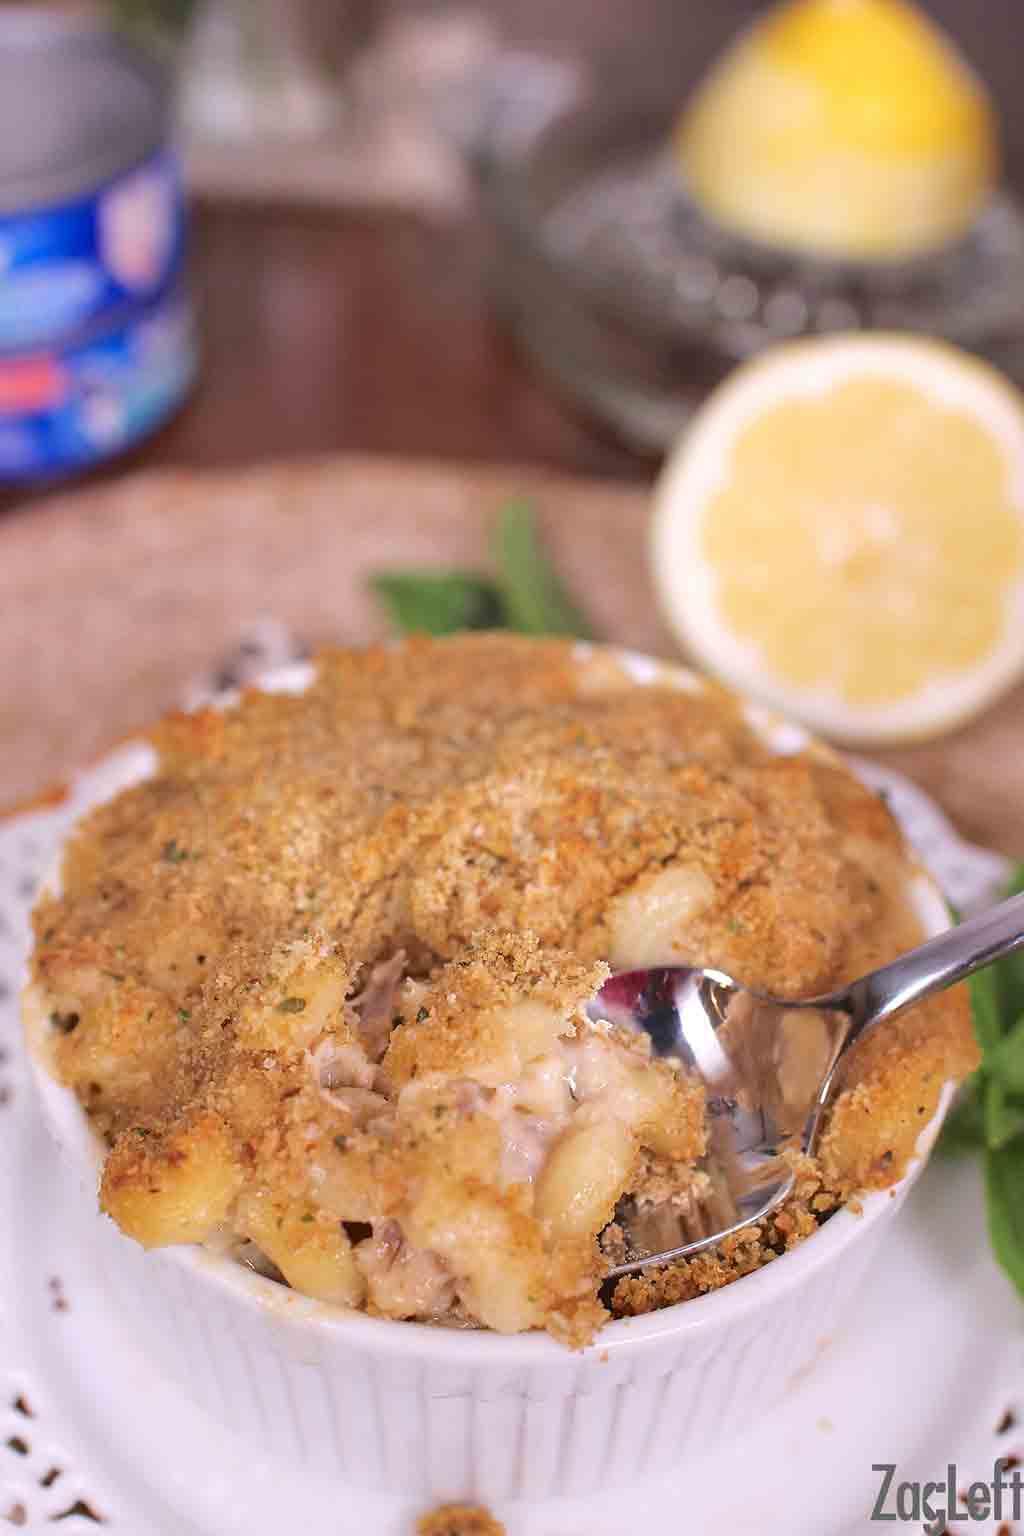 A closeup of a spoonful of tuna casserole in a small bowl